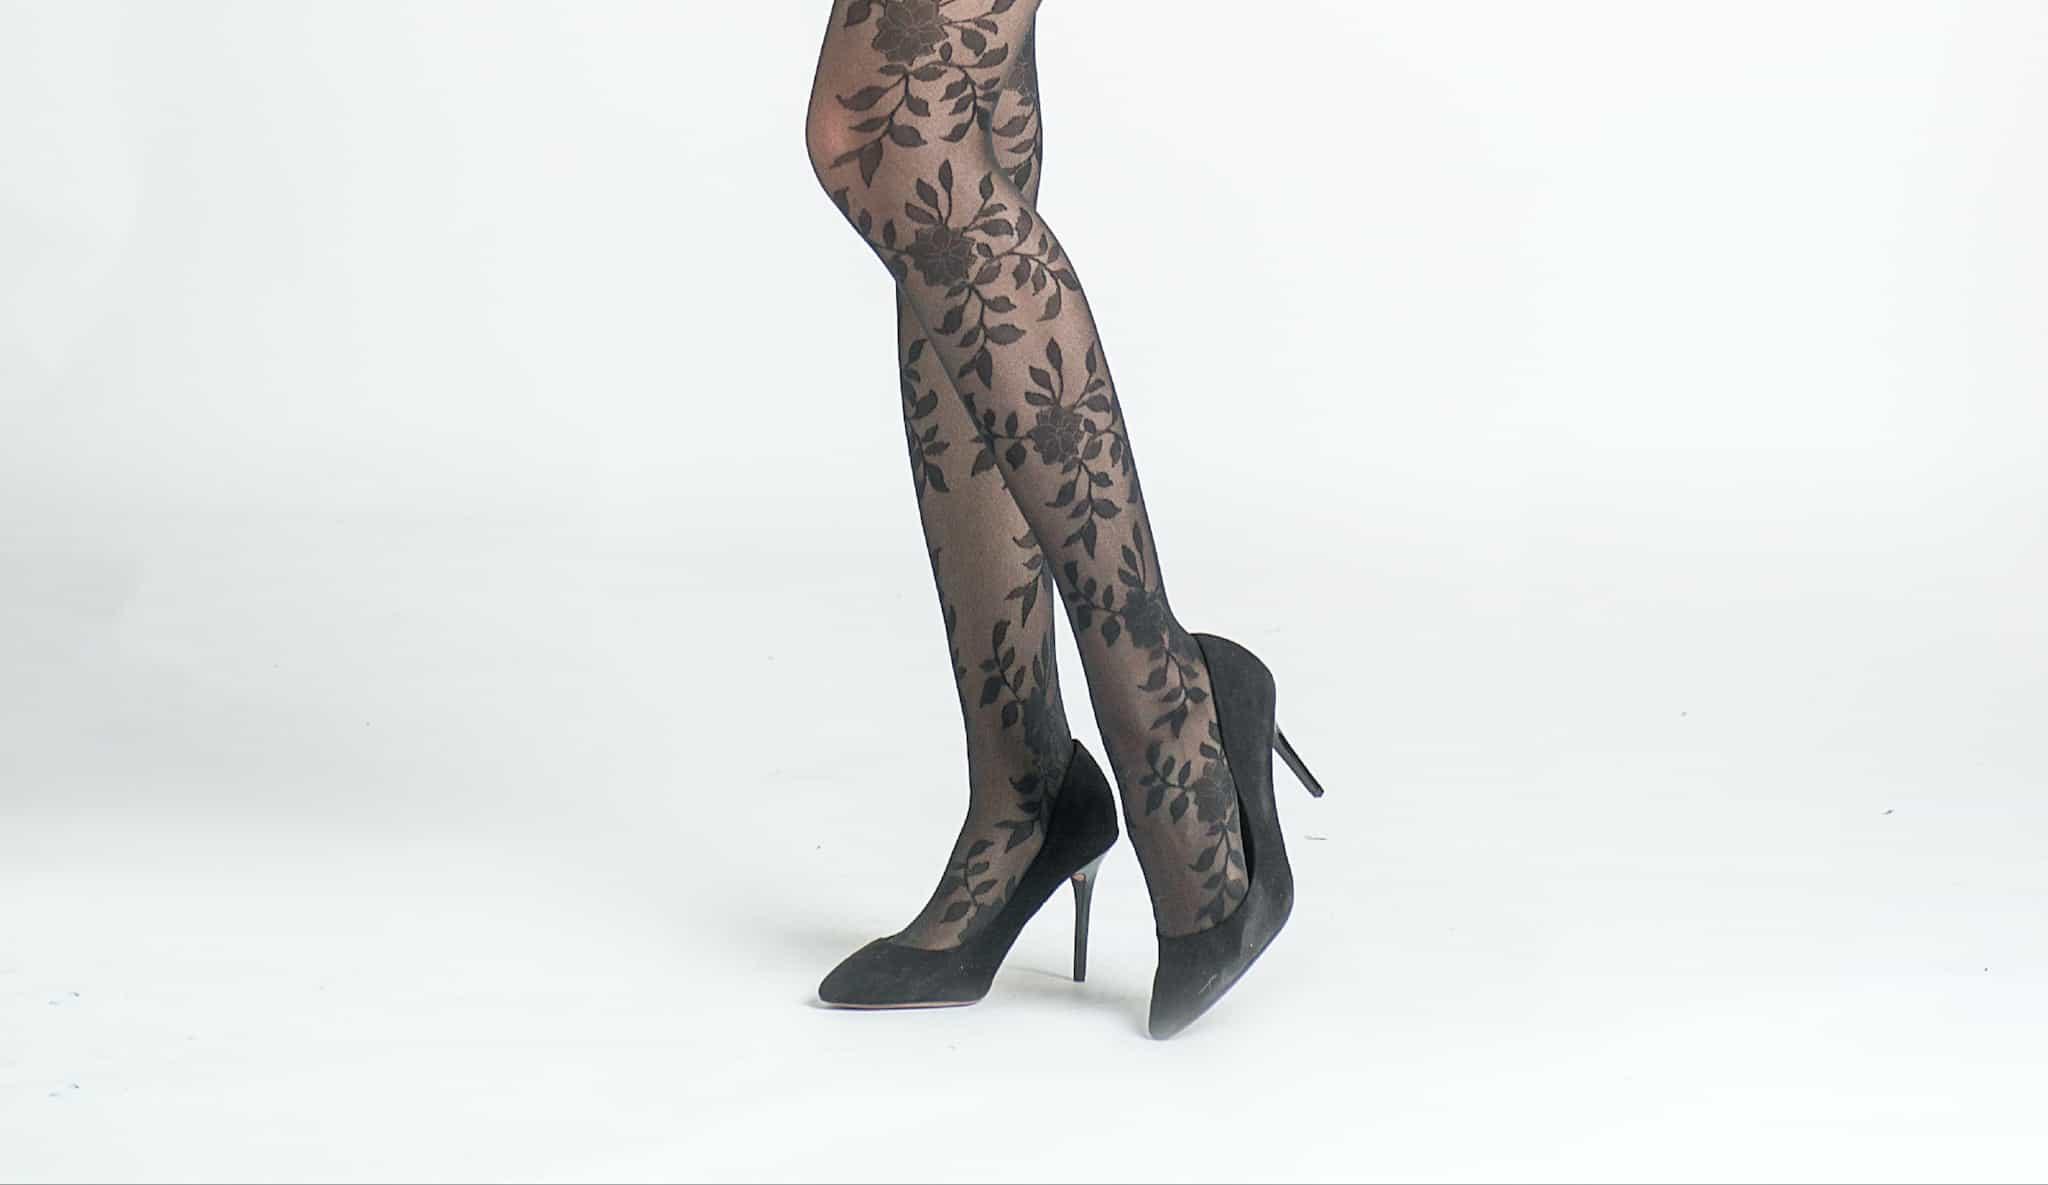 woman's legs wearing black flowery tights with black high heels